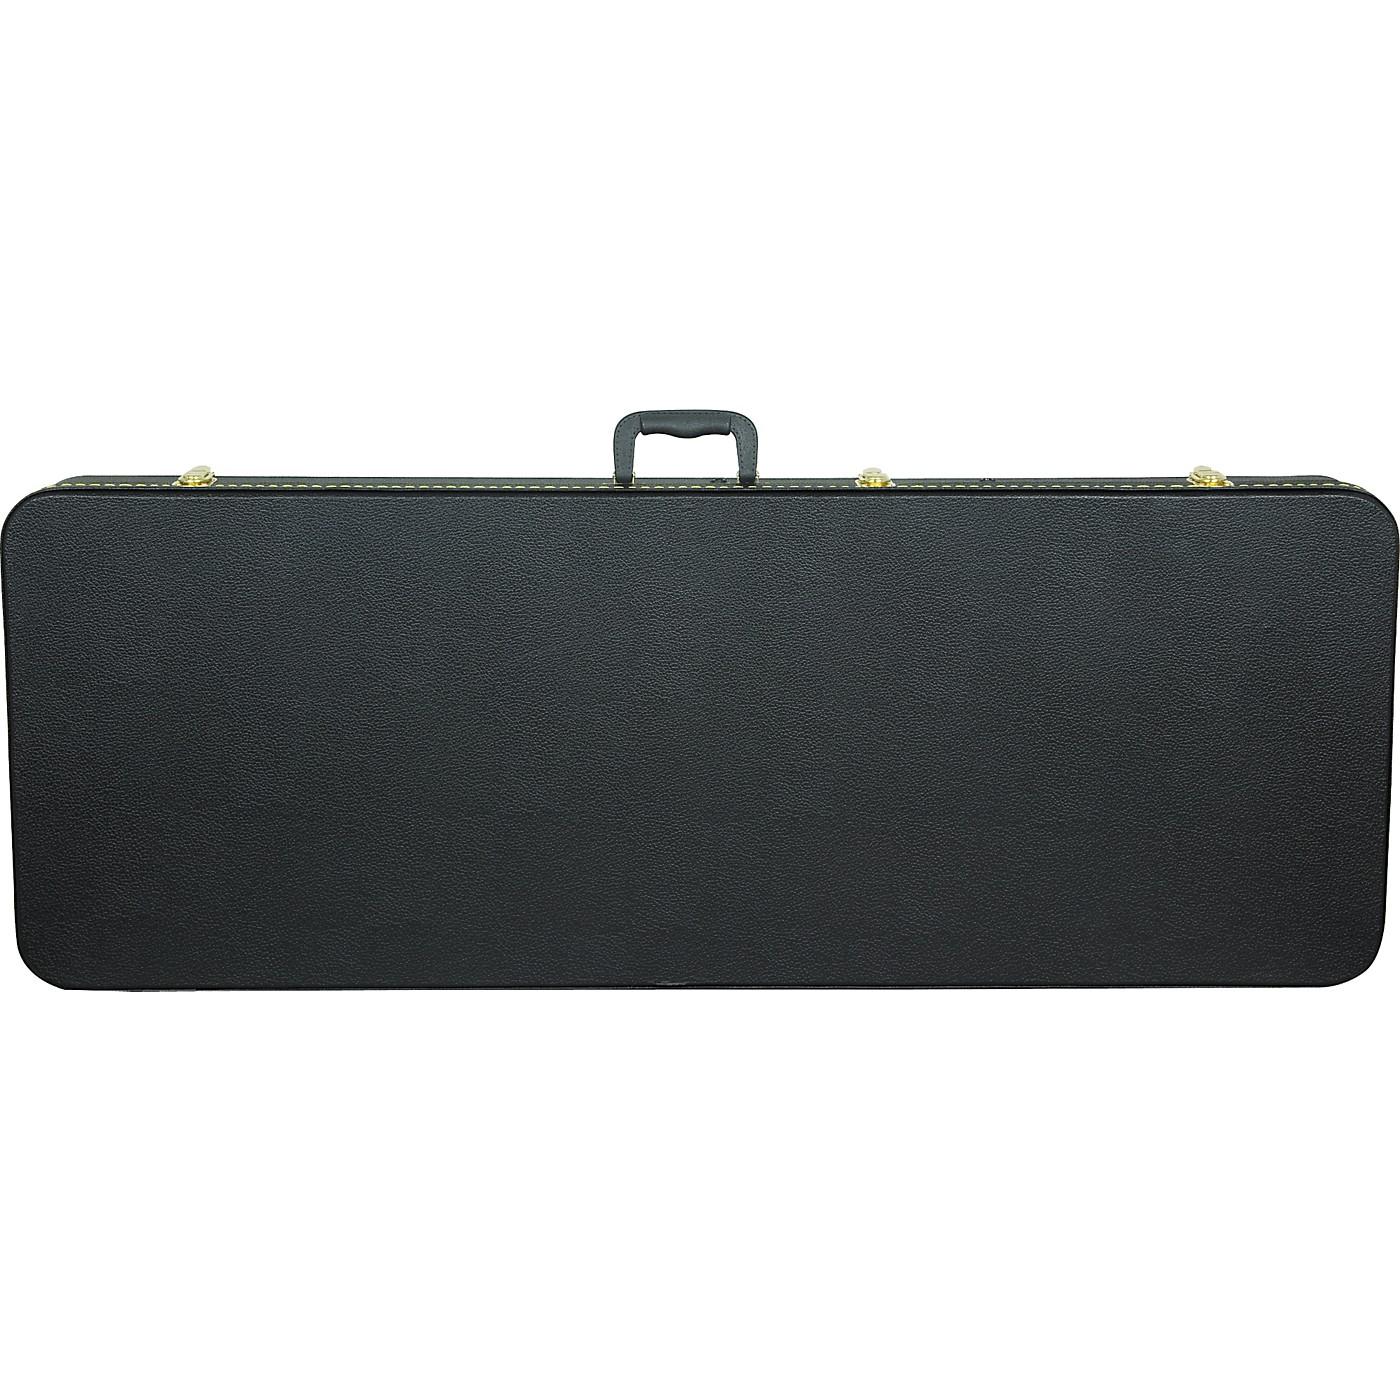 Musician's Gear EXP-Style Guitar Case thumbnail